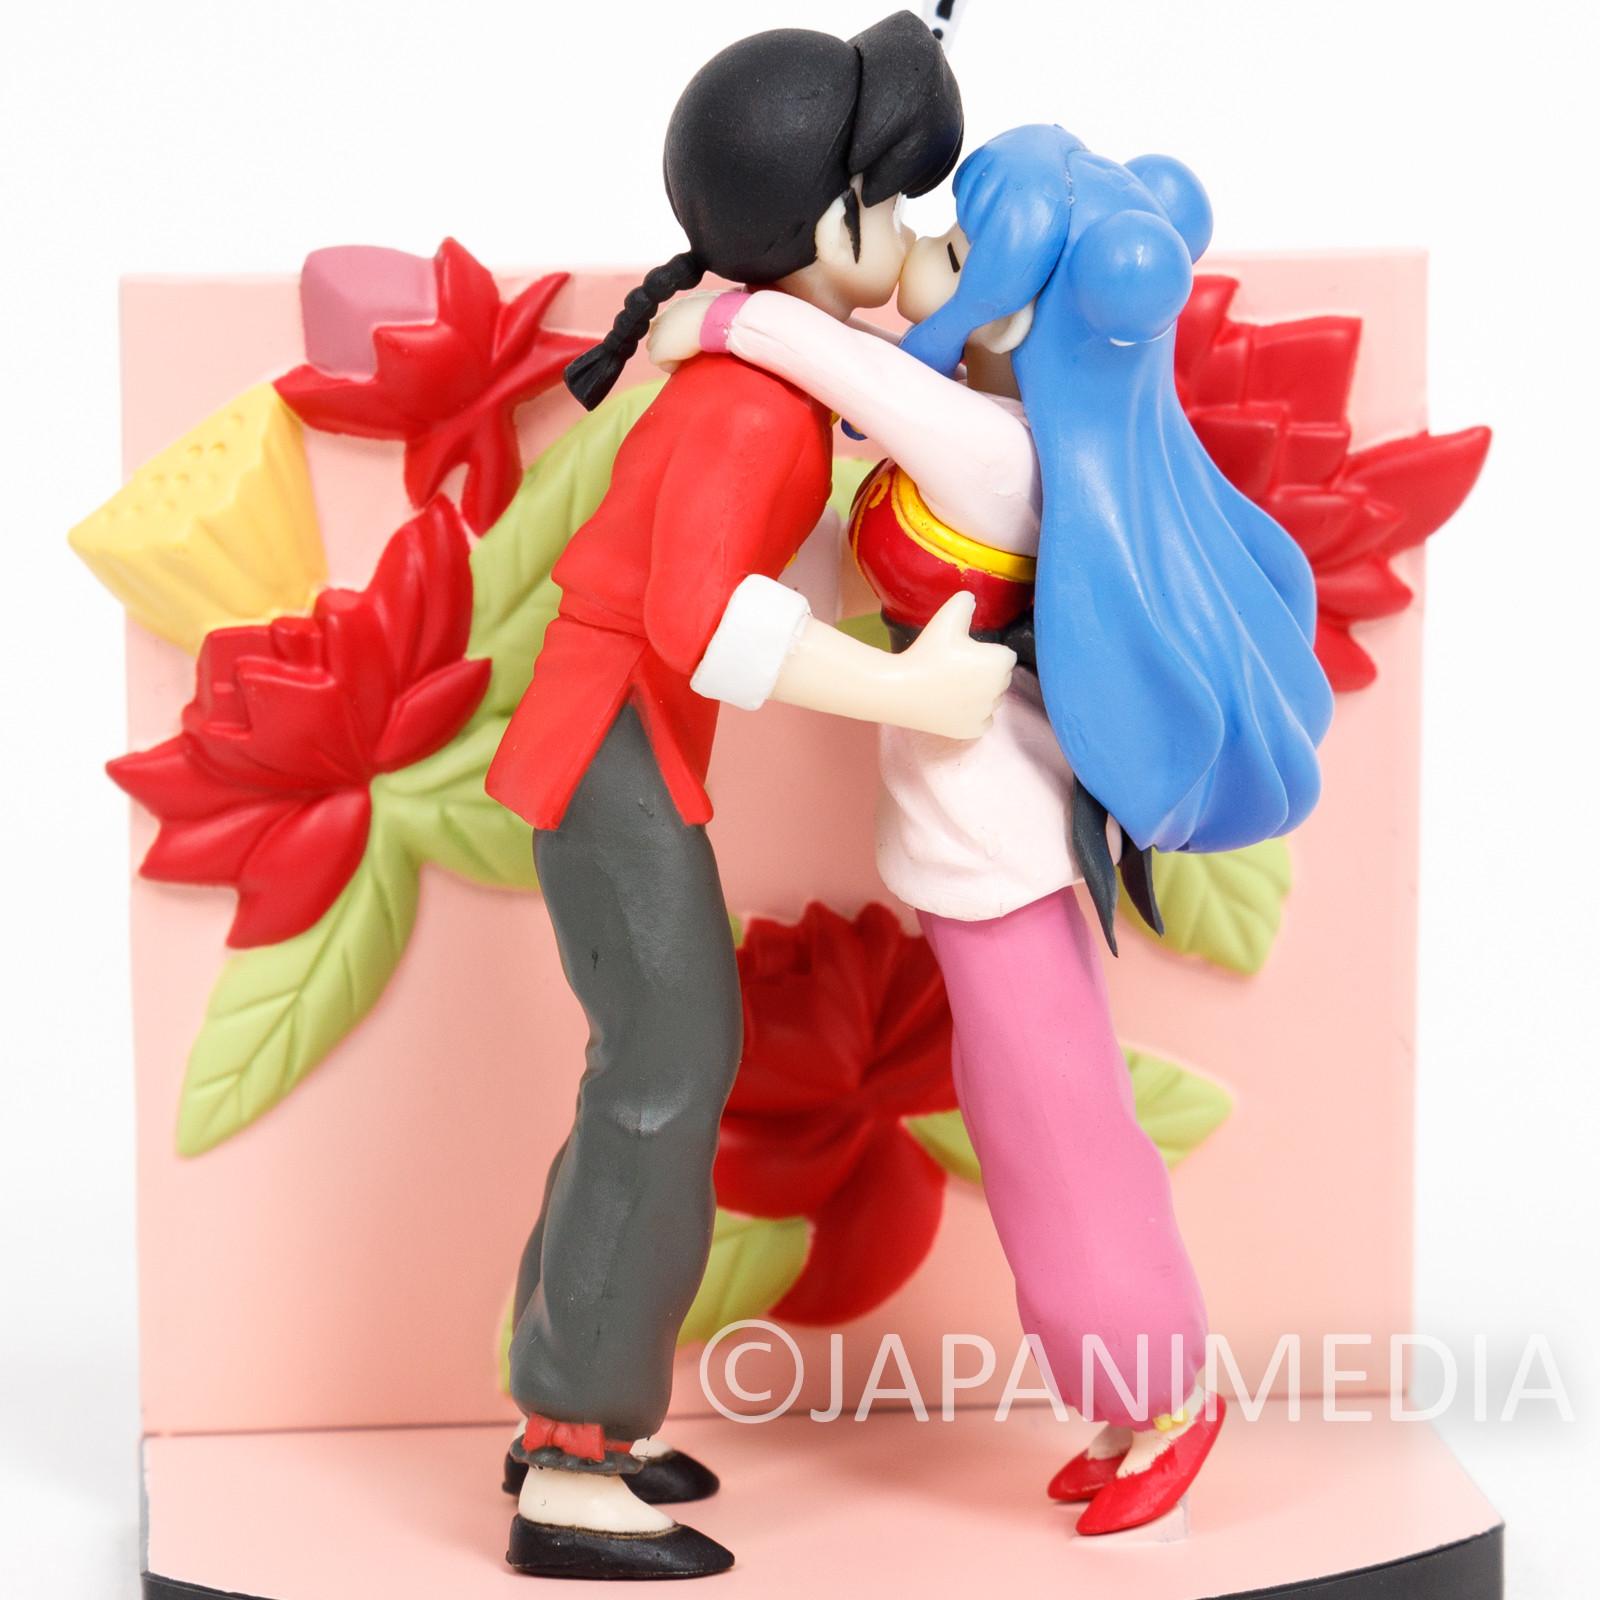 RARE! Ranma 1/2 Saotome Ranma & Shampoo Kiss Mini Diorama Figure Epoch JAPAN